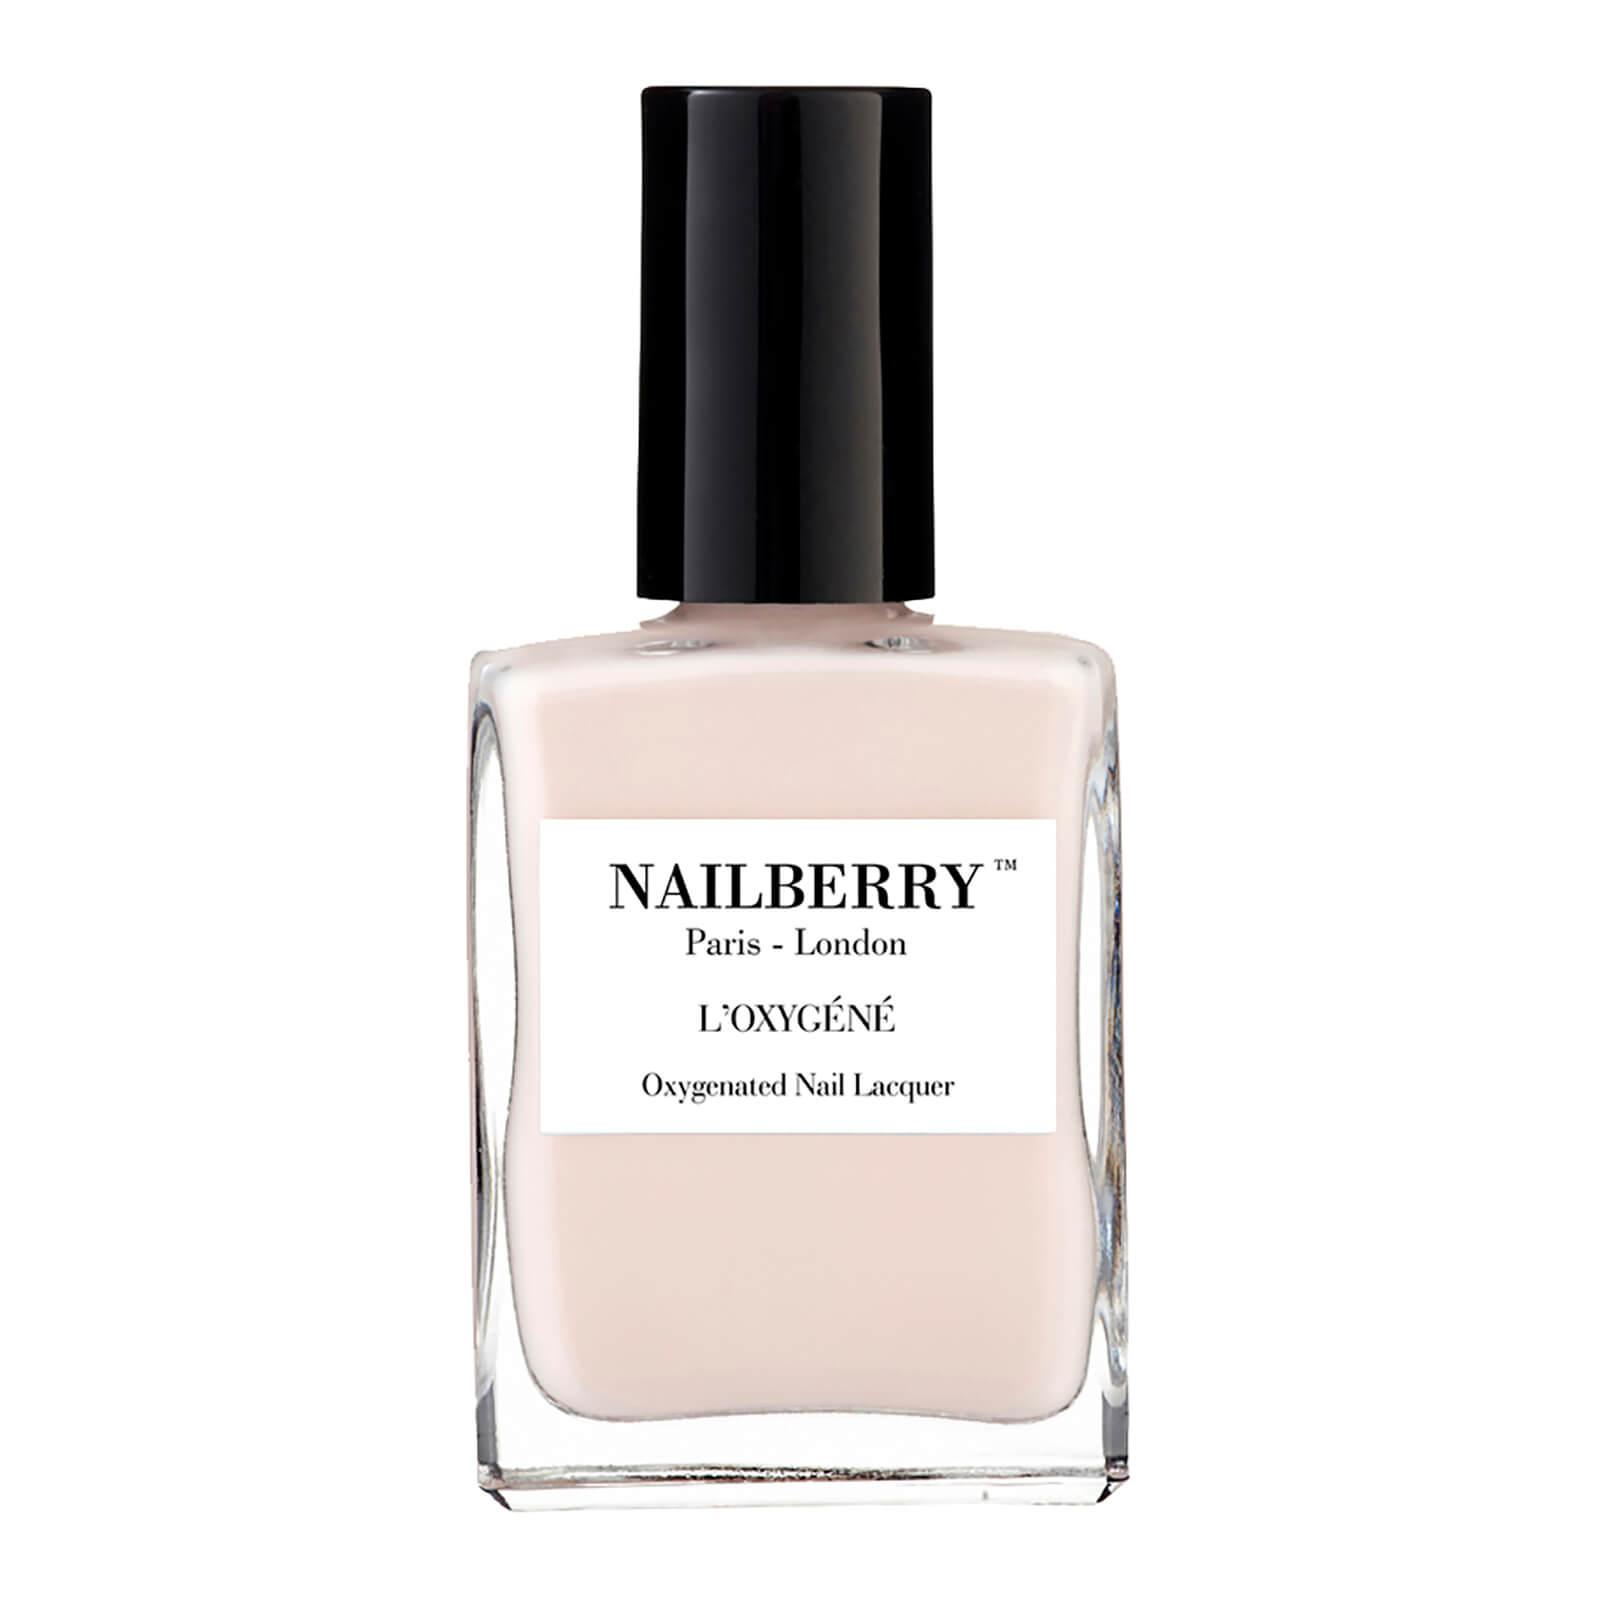 Esmalte de uñas L'Oxygene de Nailberry - Almond